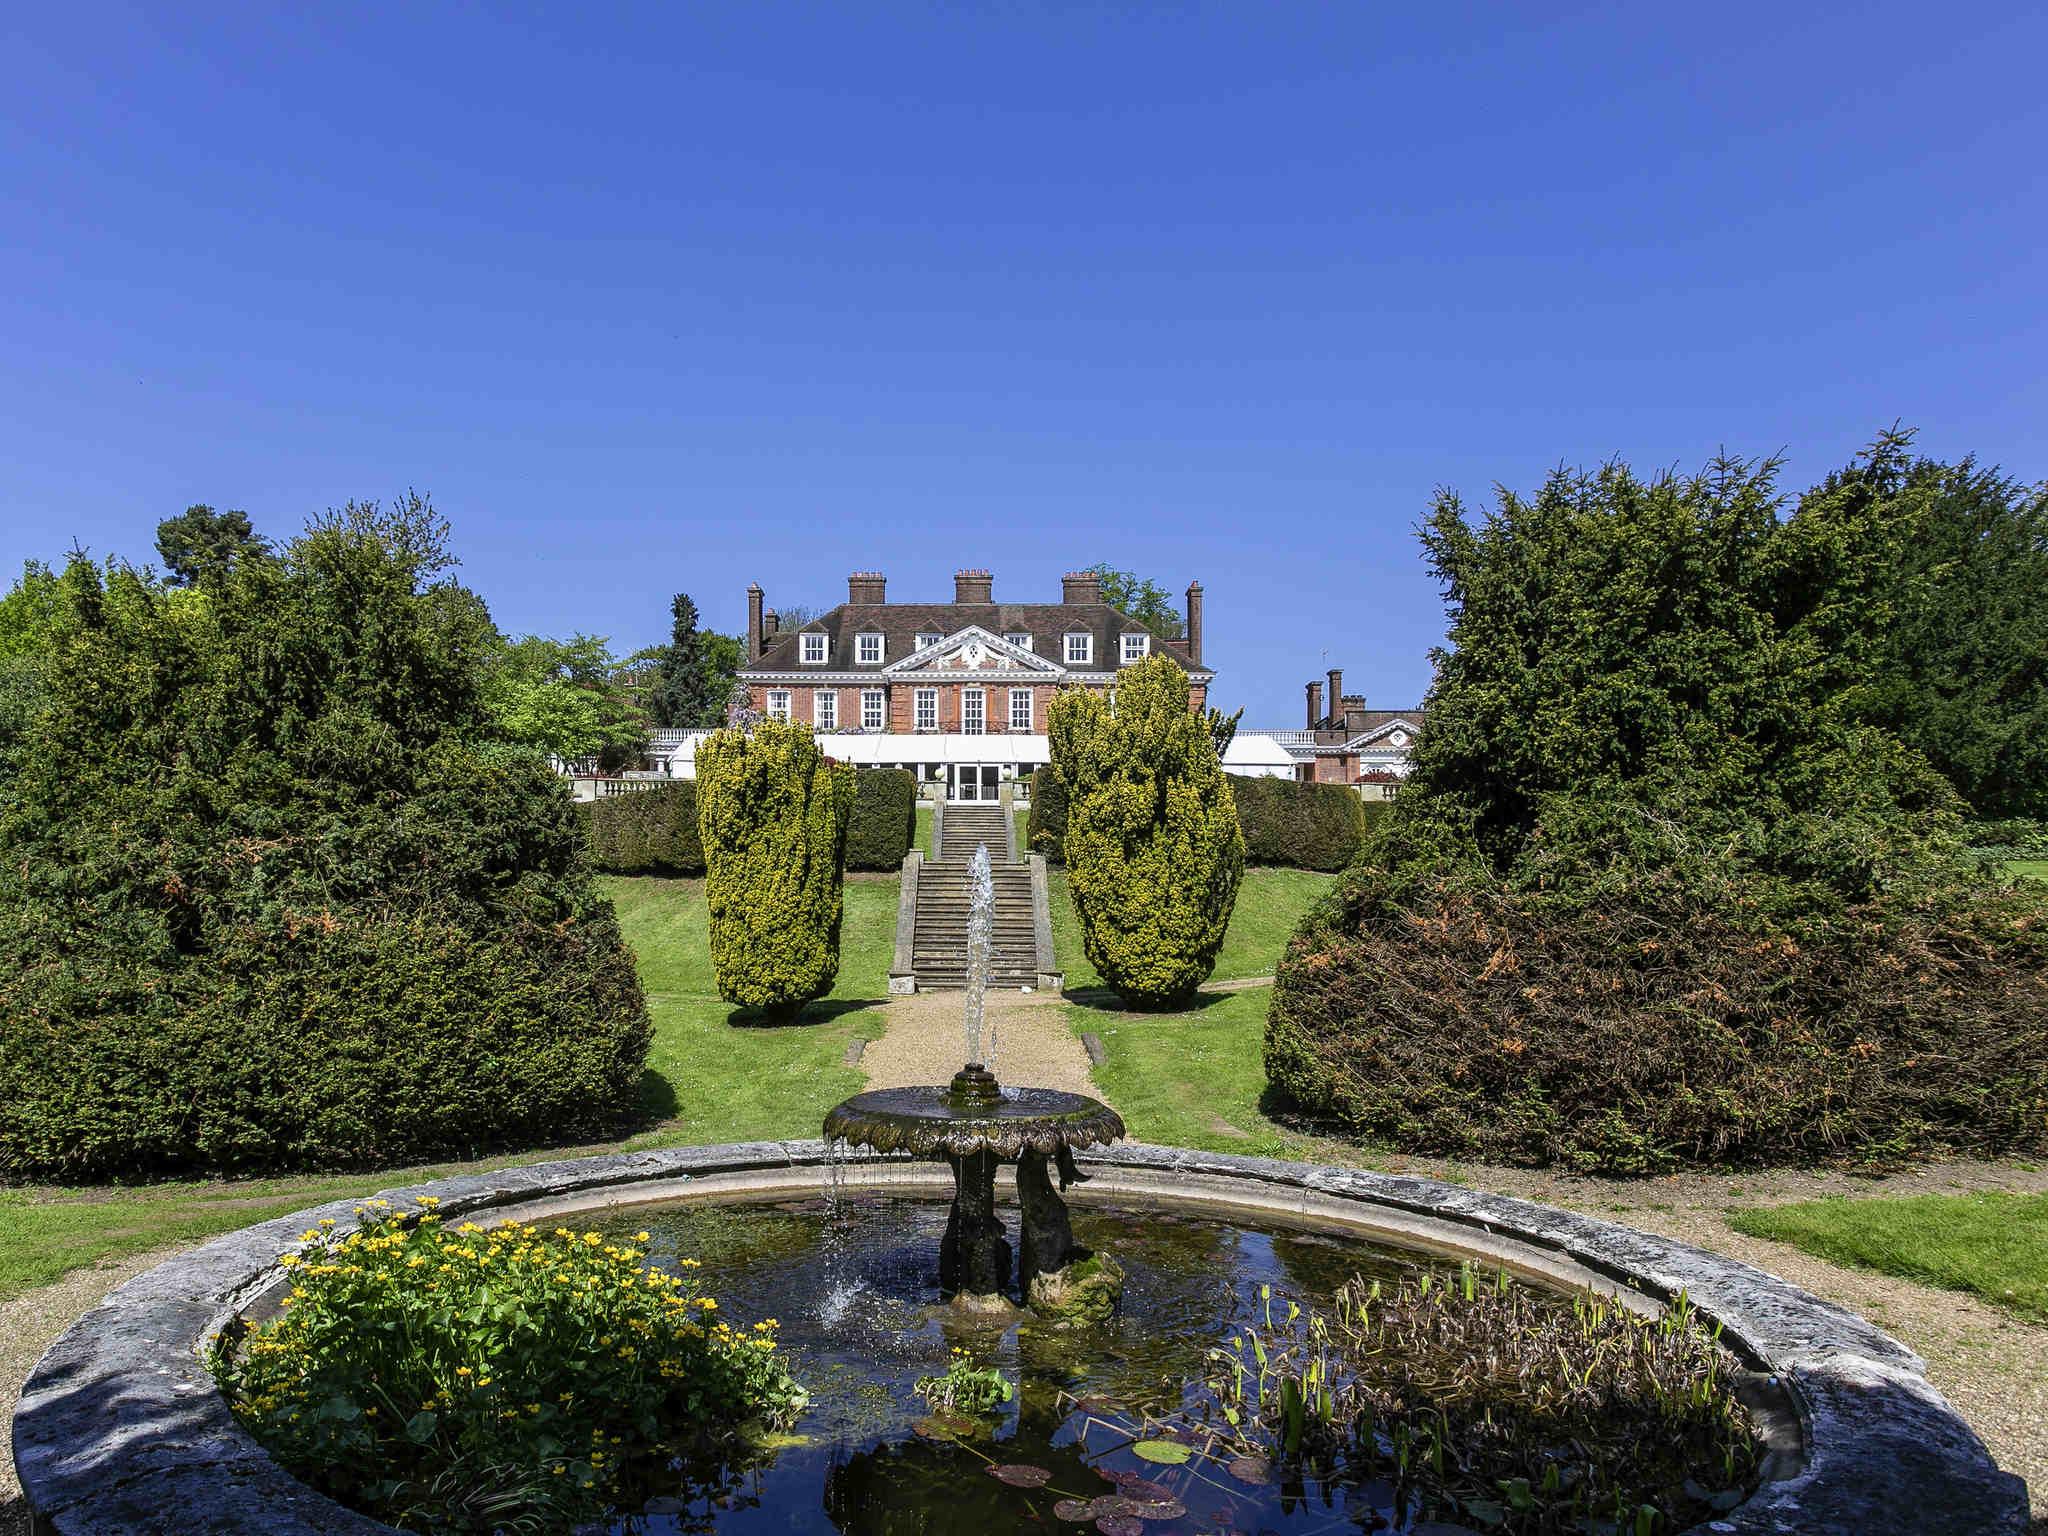 Hotel – Mercure London North Watford Hunton Park Hotel